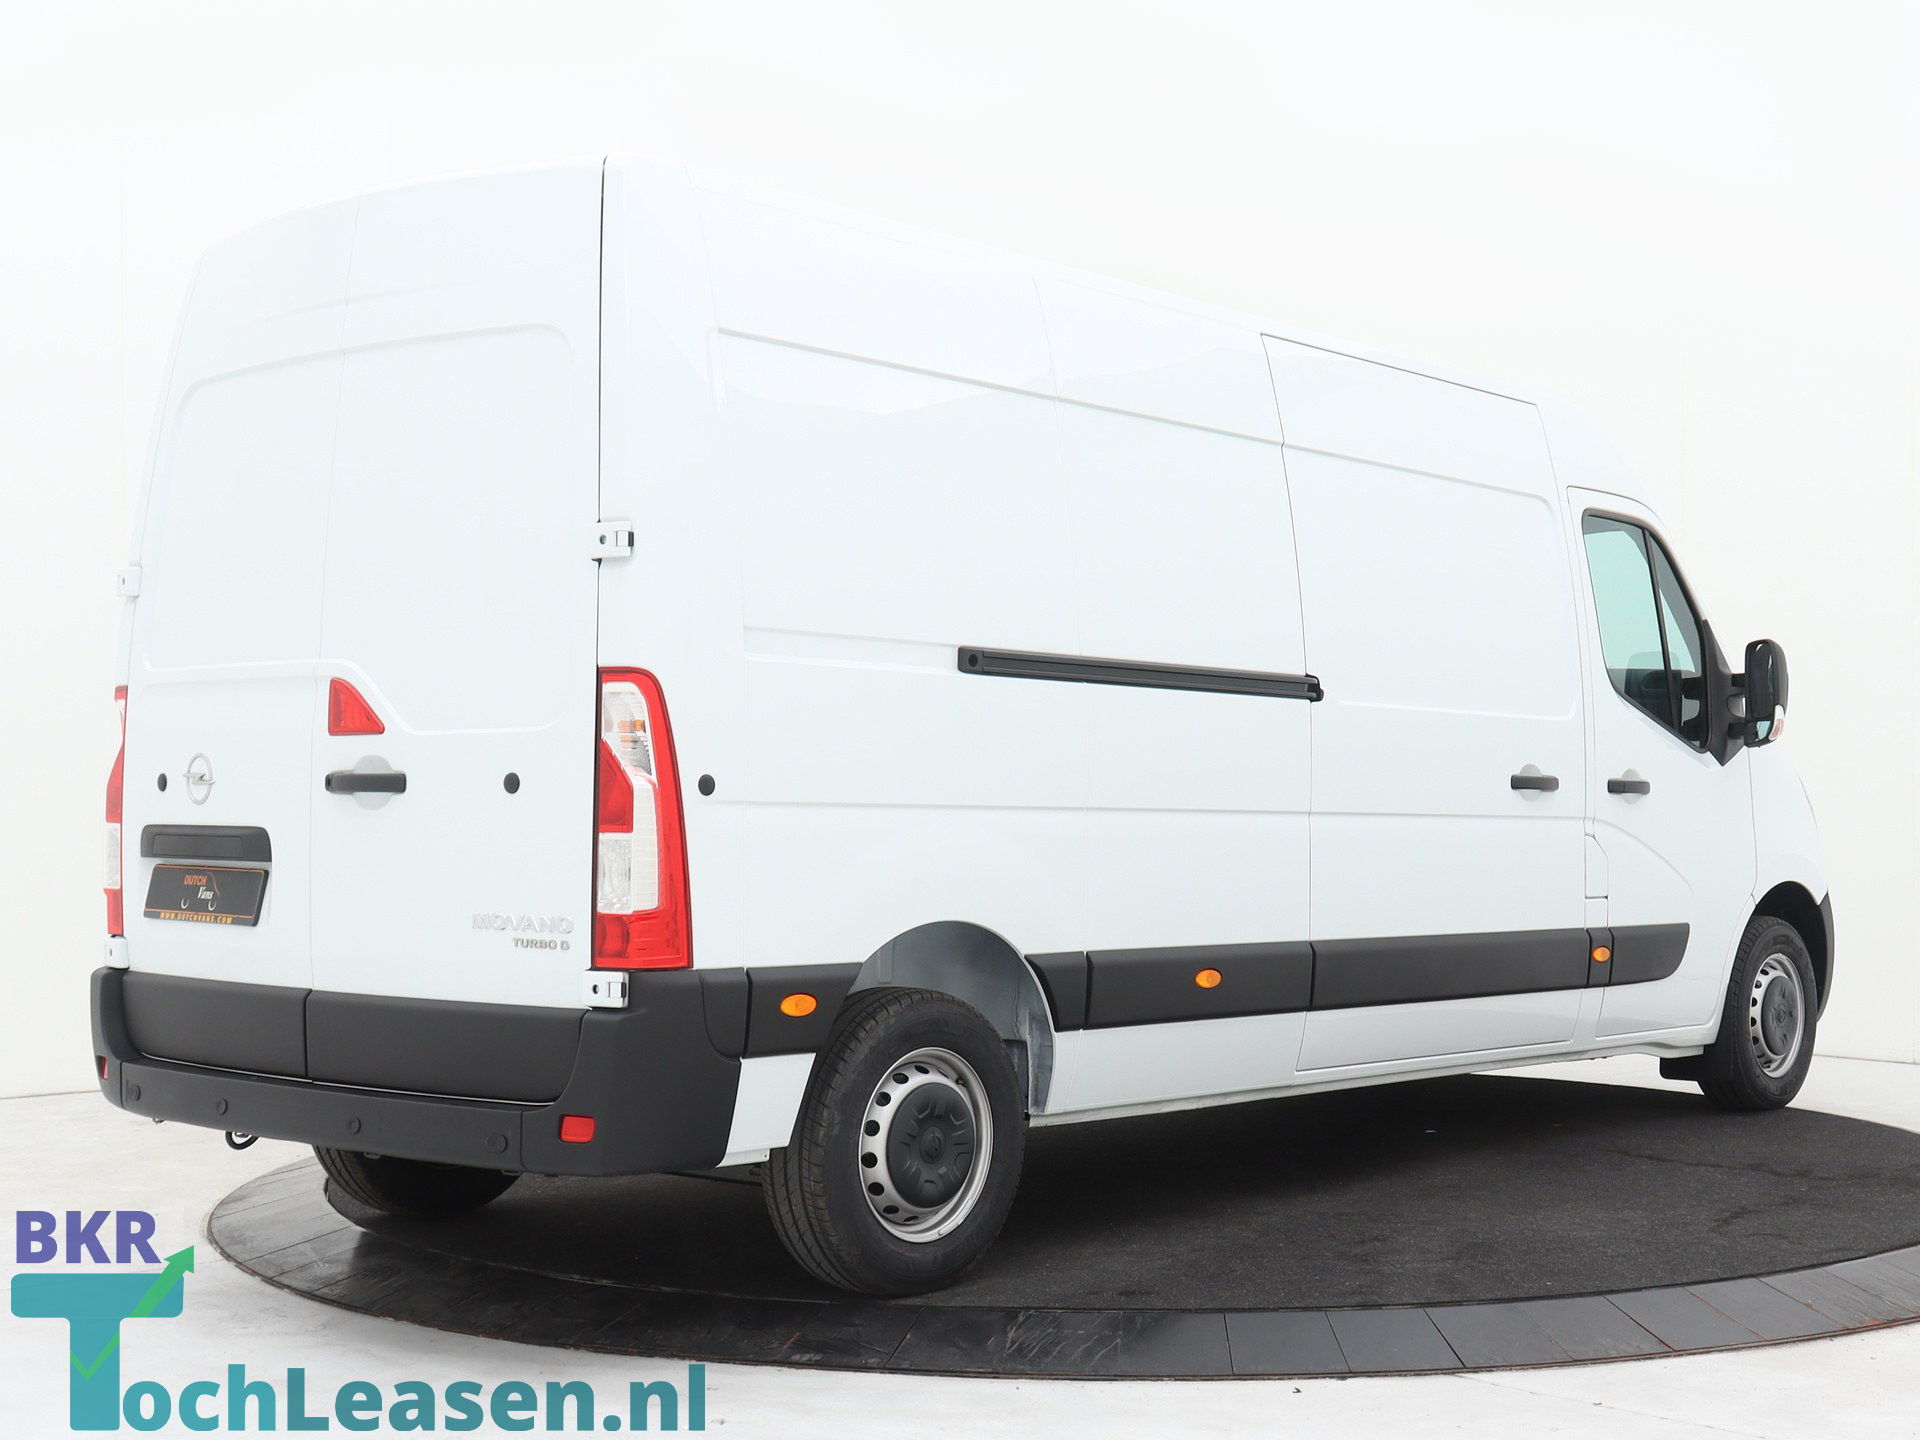 BKRTochLeasen.nl - Opel Movano - L3H2 - wit 12